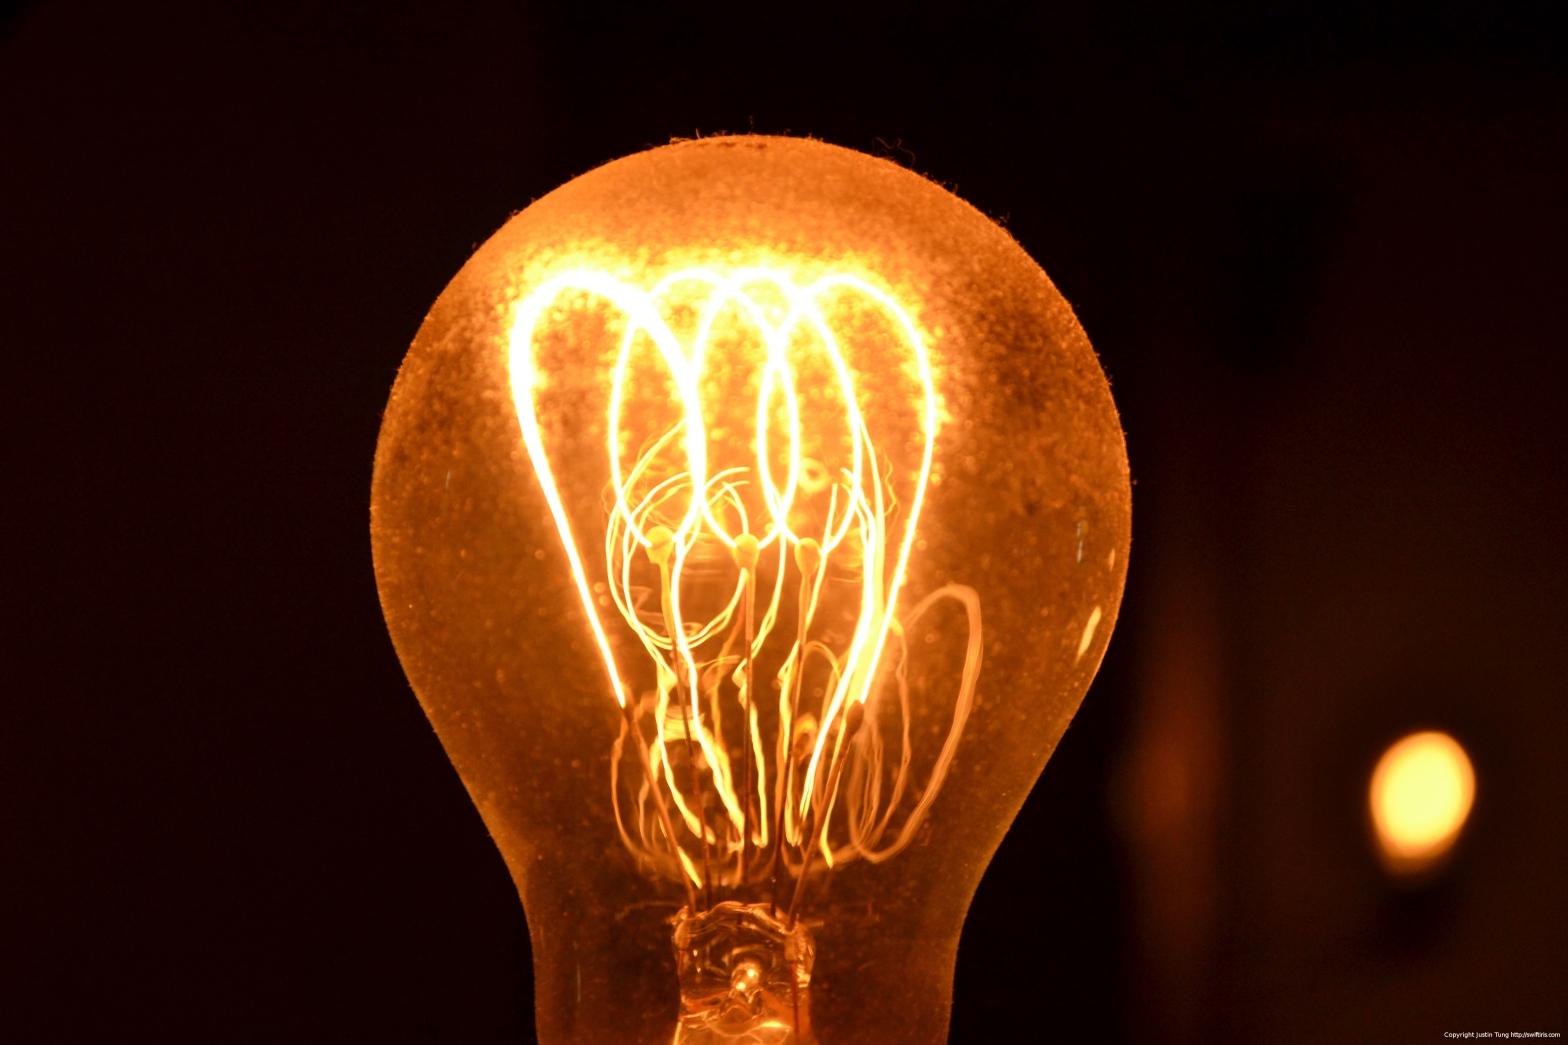 Light bulb copyright Justin Tung